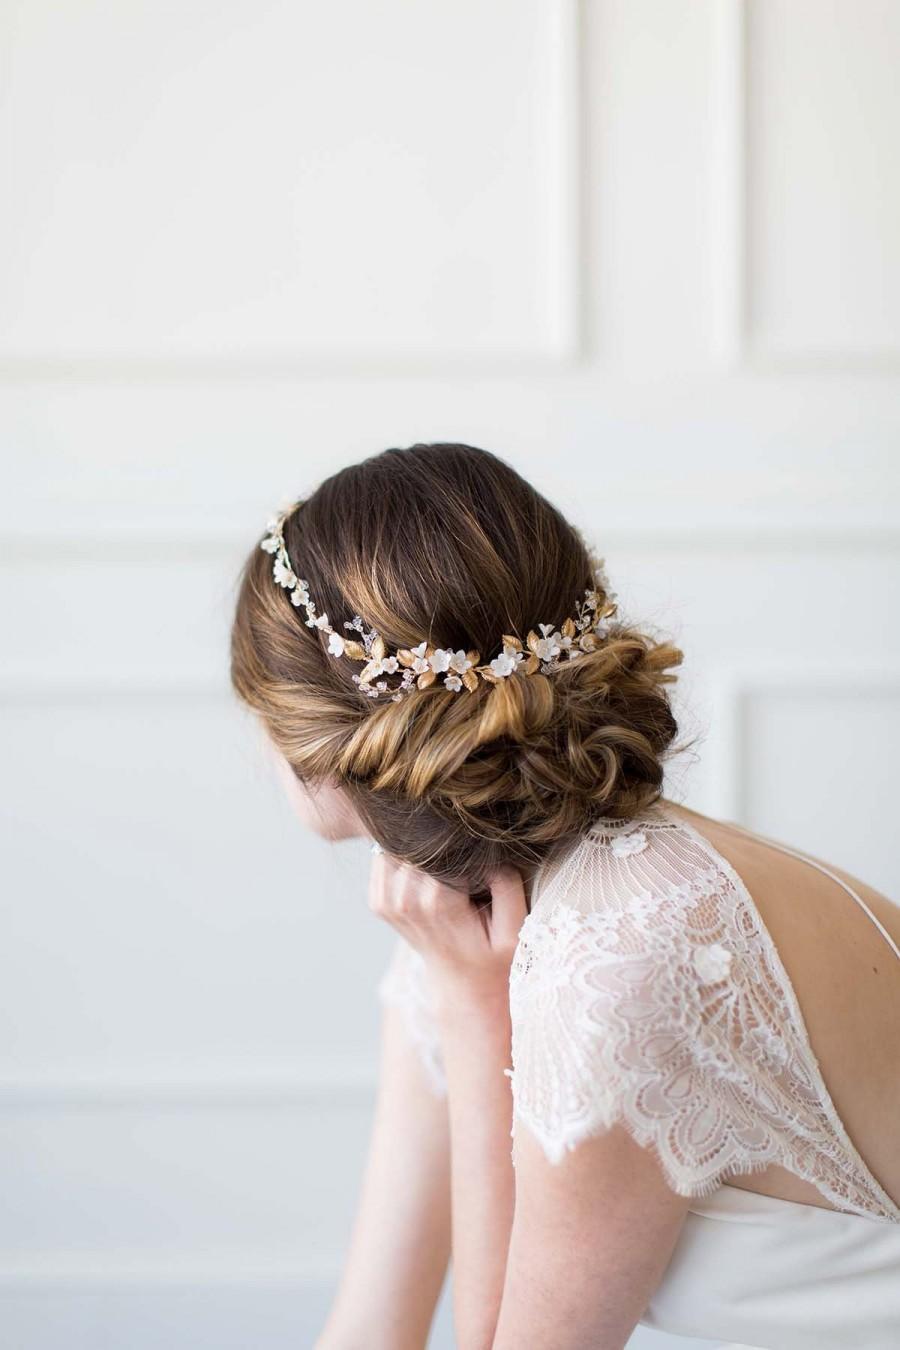 Свадьба - Gold Bridal Crown, Bridal Halo, Wedding Hair Accessory, Bridal Circlet, Gold Wedding Hair Piece, Wedding Headpiece - GUIRLANDE de FLEUR